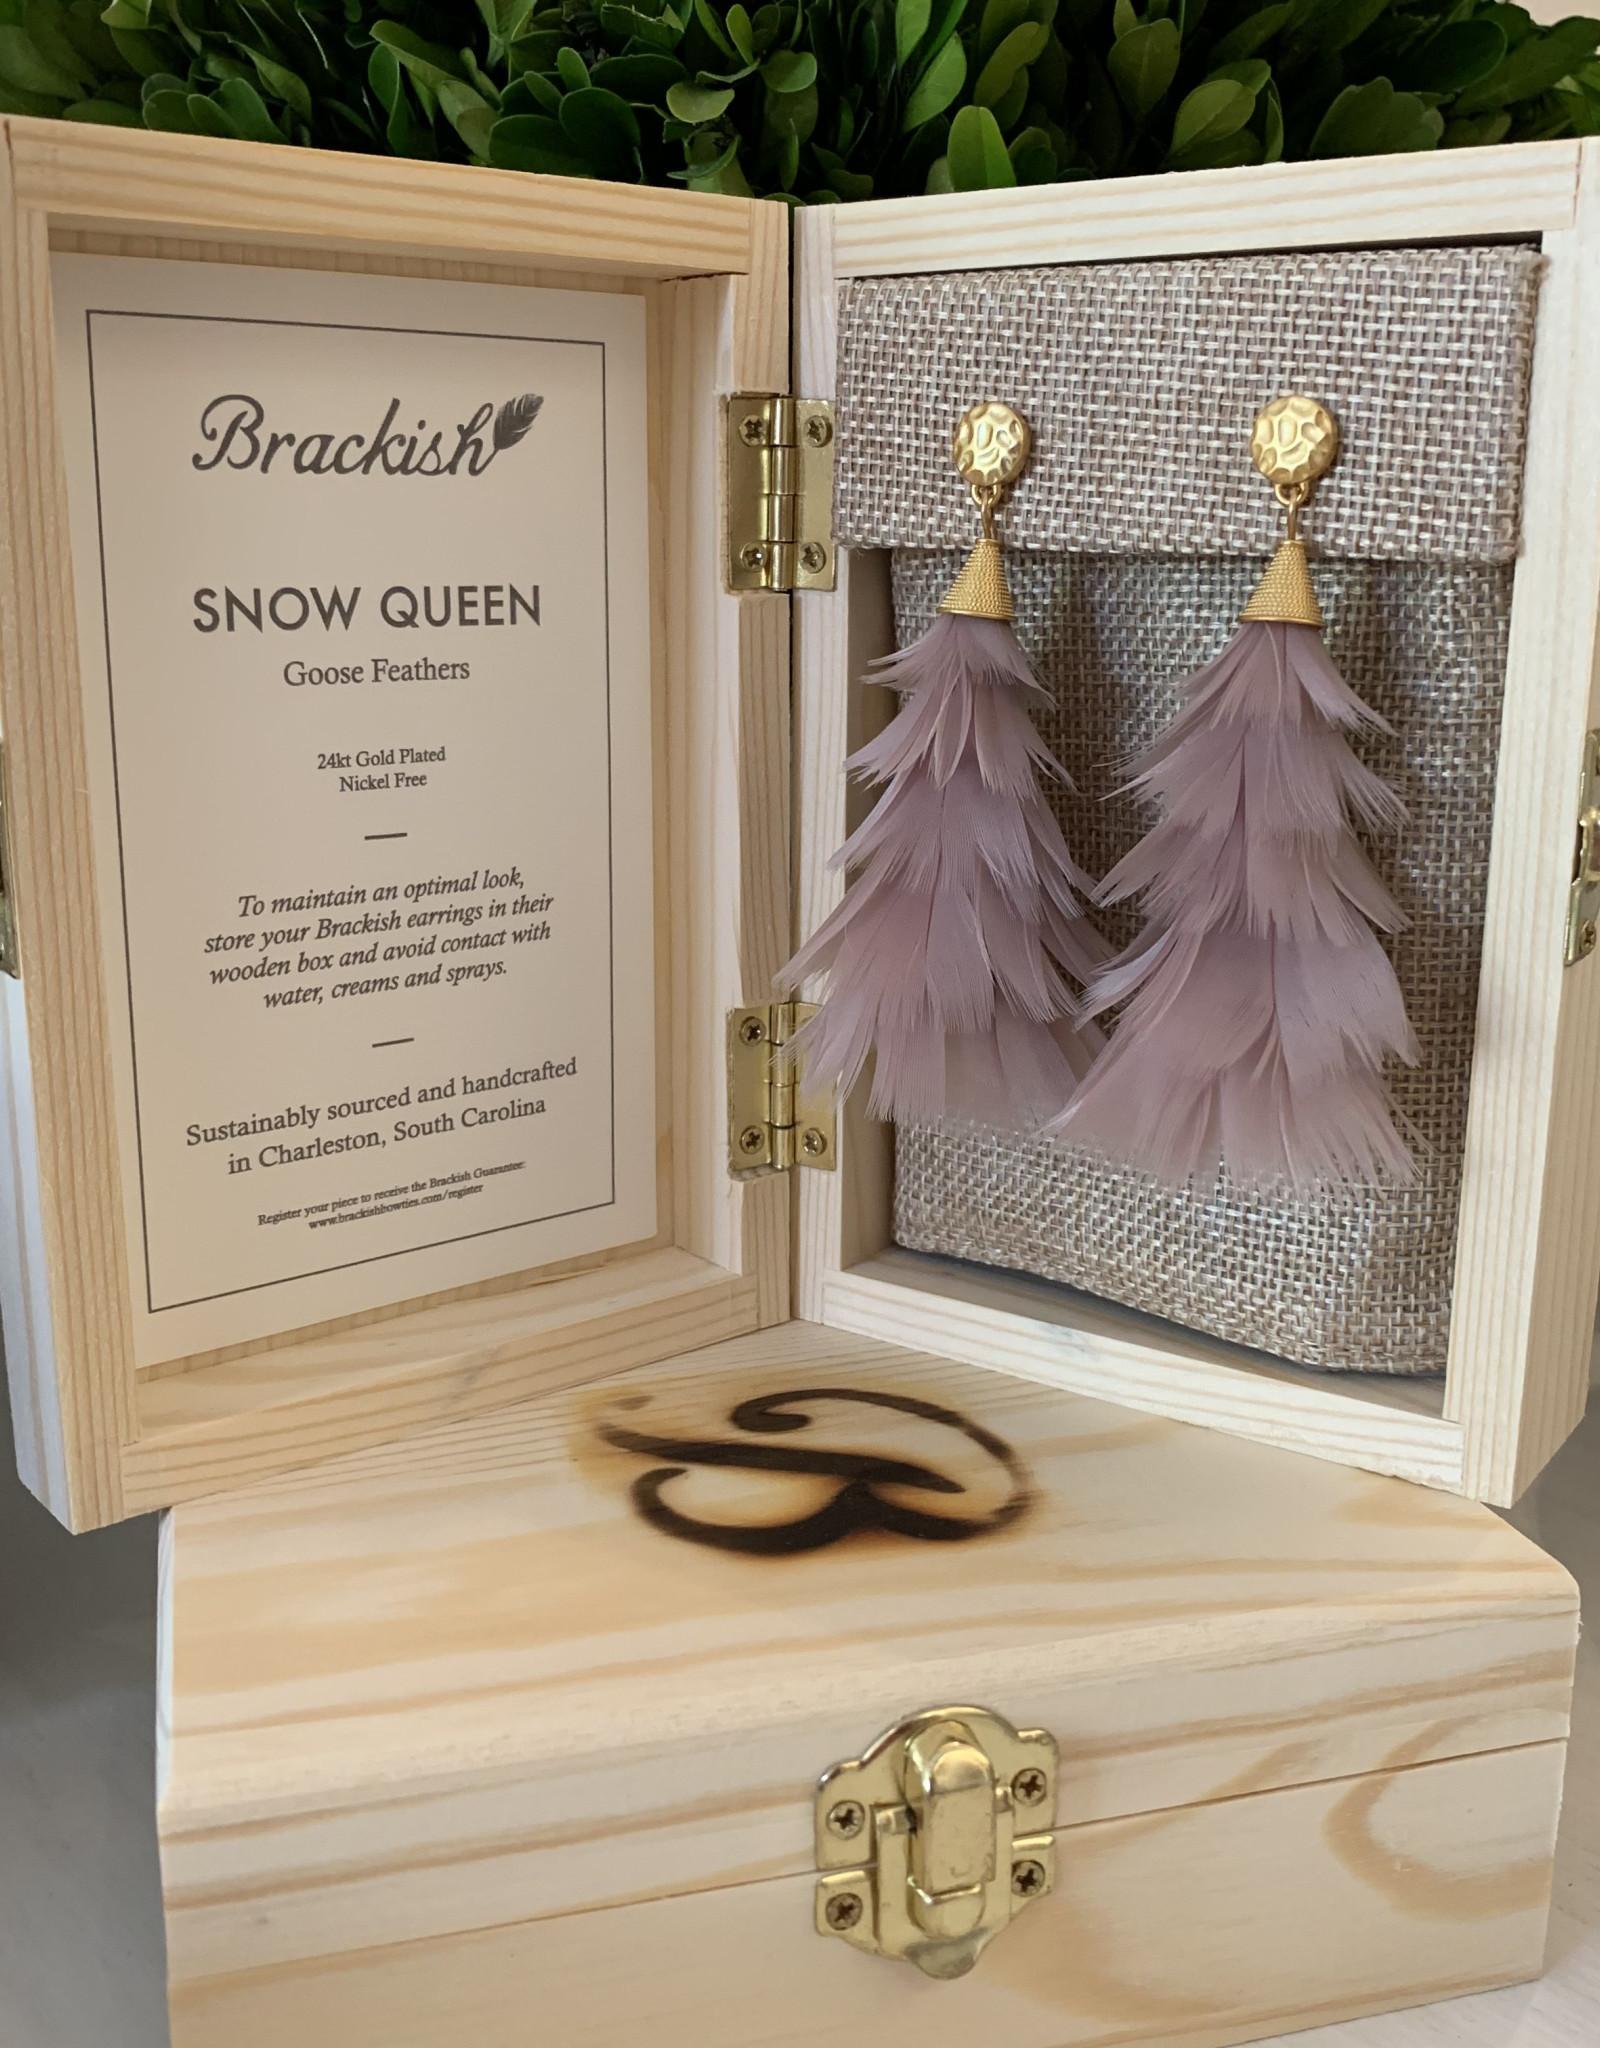 Brackish Snow Queen Earrings - Goose Feathers